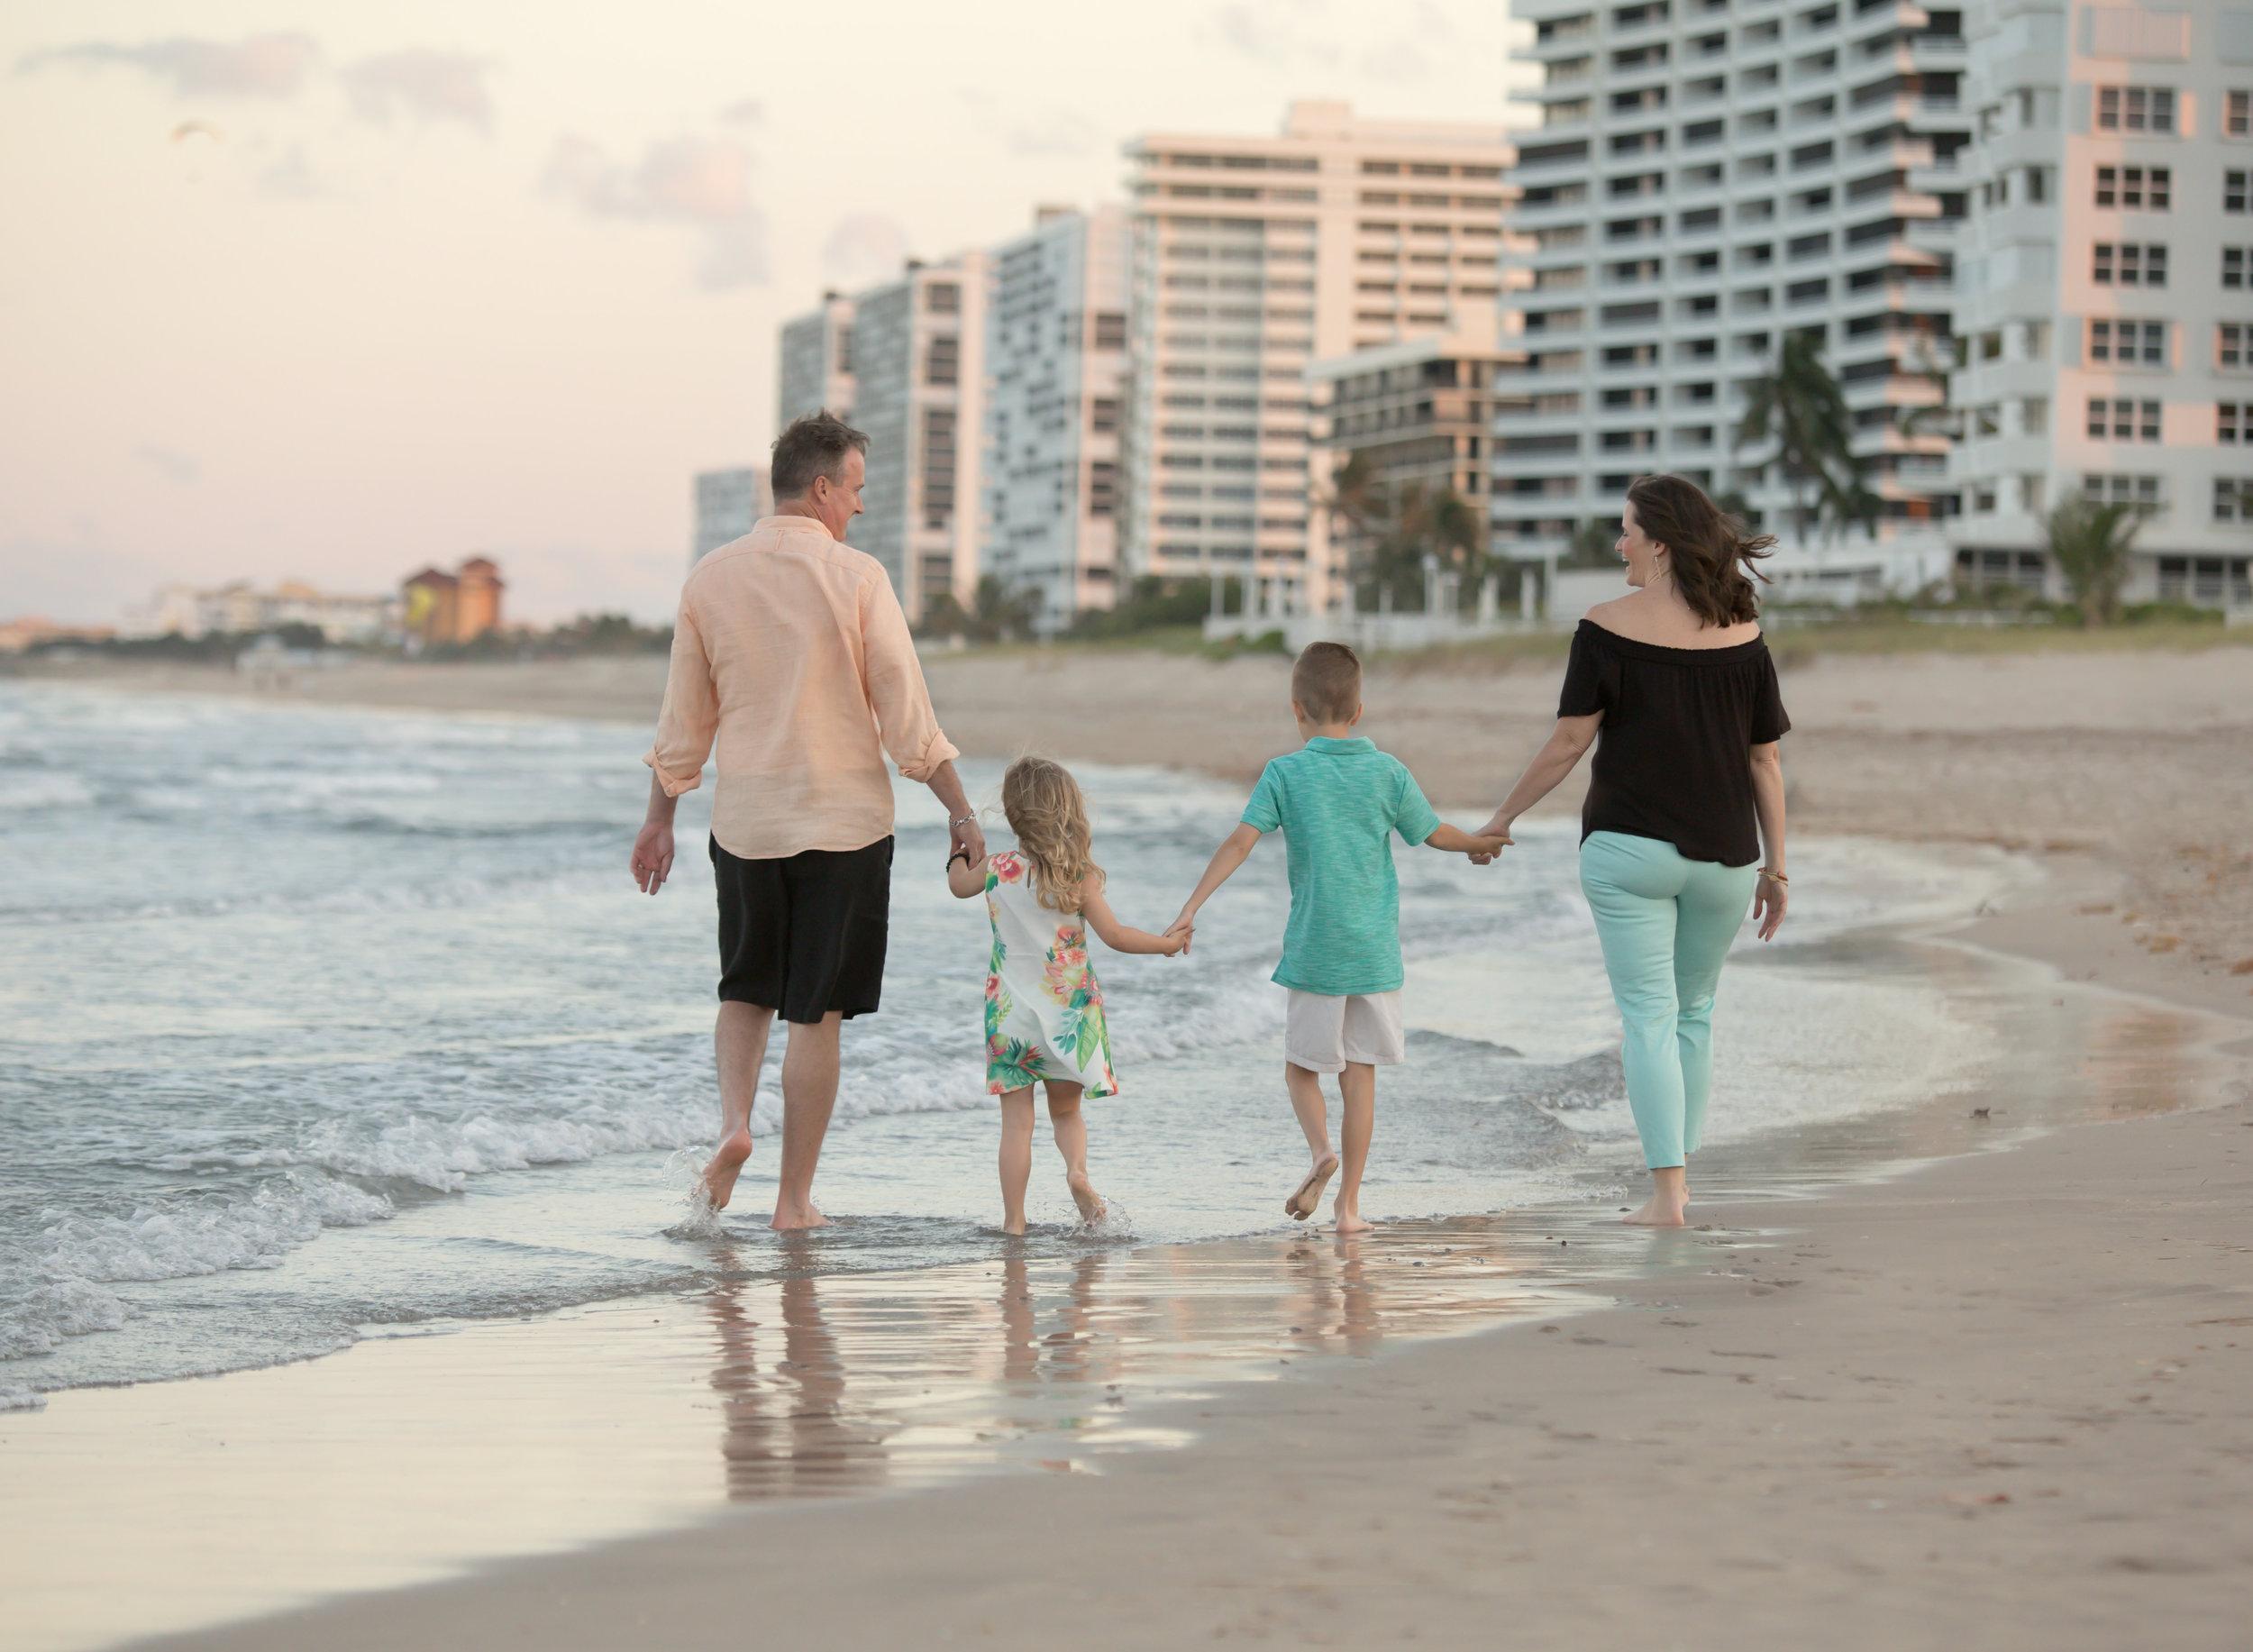 boca-raton-child-photographer-parkland-family-photographer-coral-springs-wellington-lake-worth-boynton-lantana-alissa-delucca-photography-family-beach-walk.jpg